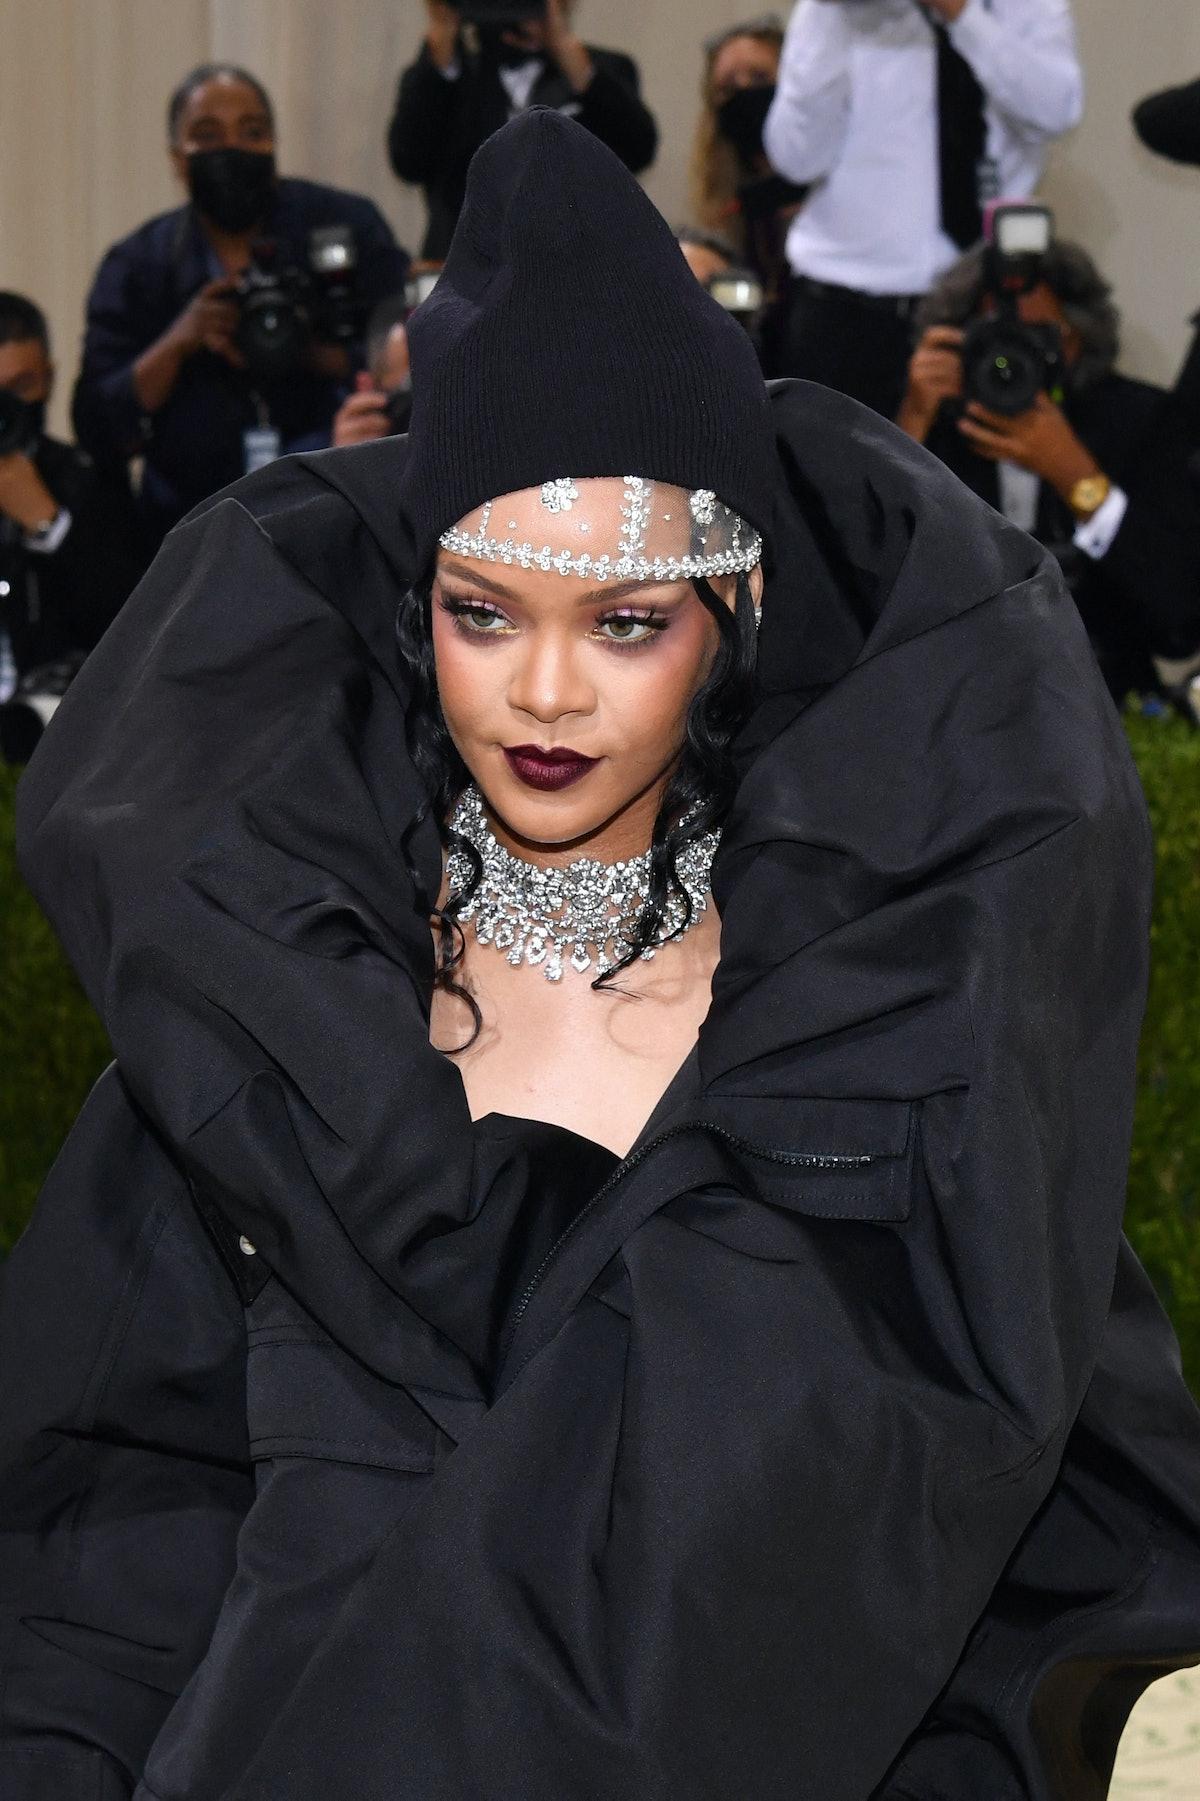 Barbadian singer Rihanna arrives for the 2021 Met Gala at the Metropolitan Museum of Art on Septembe...